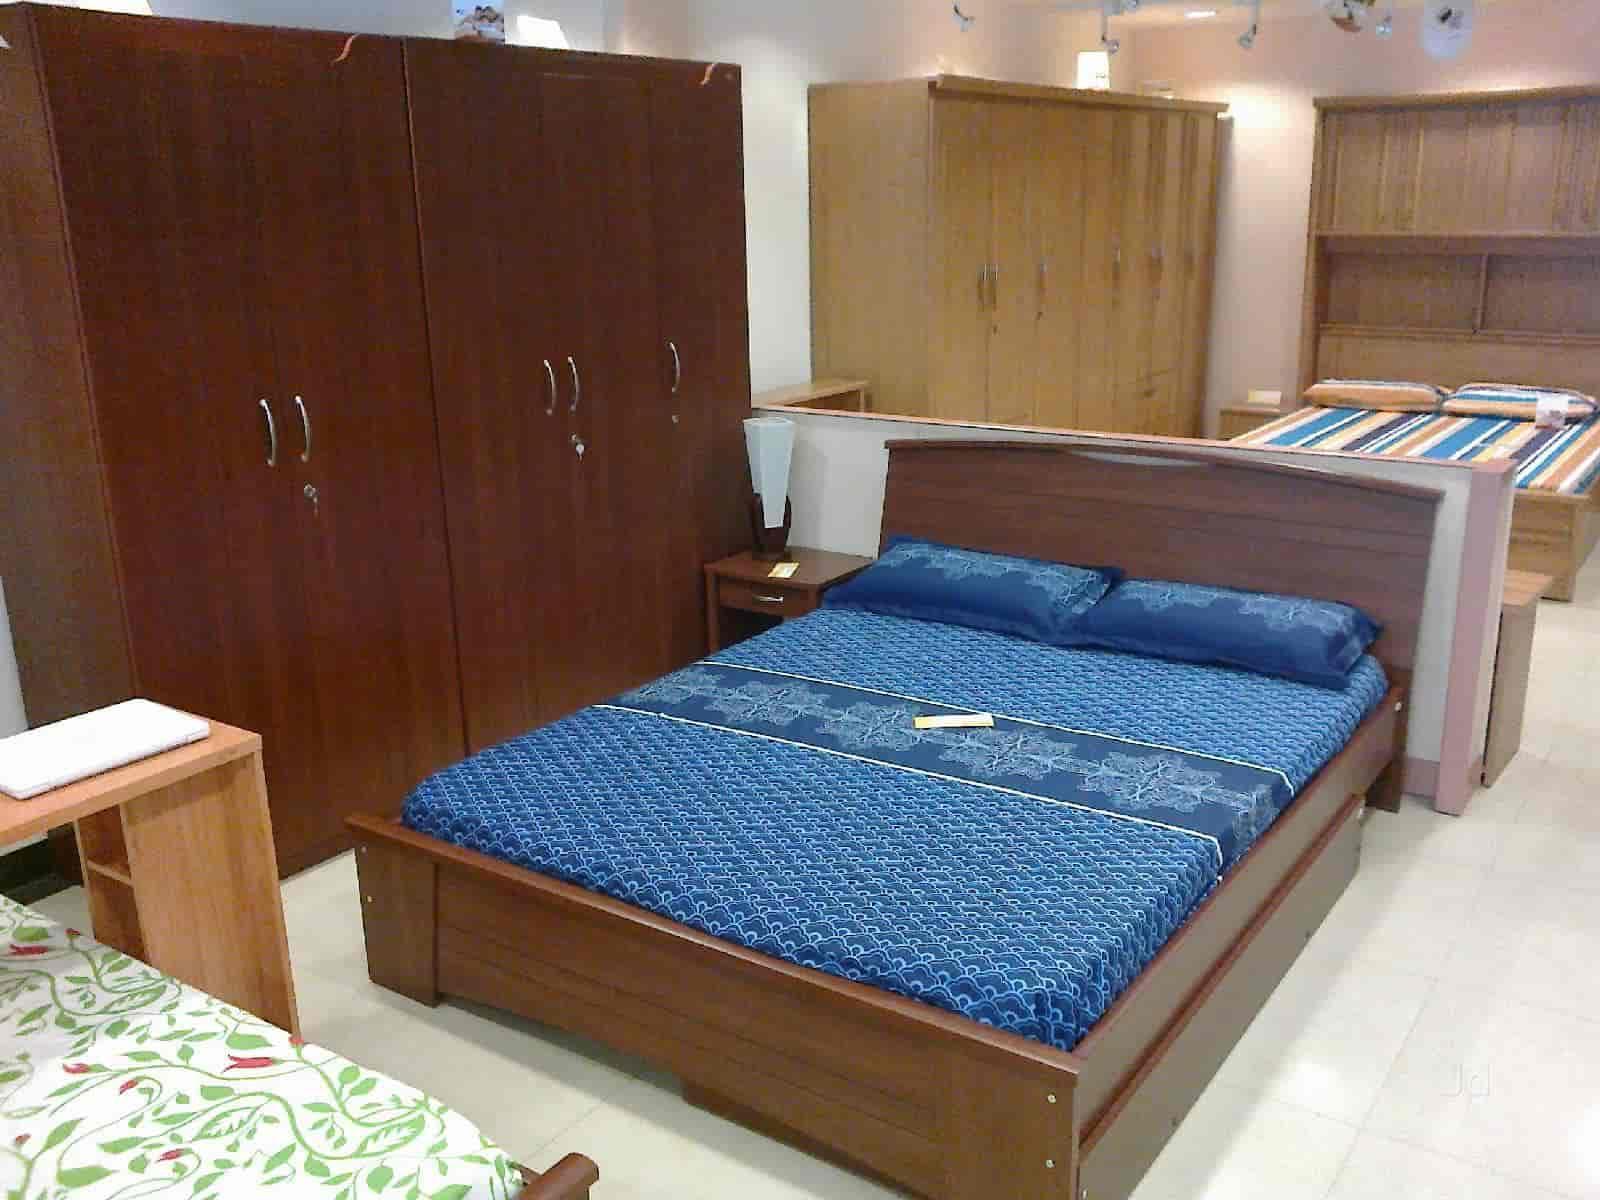 Sandeep sales corporation stylespa furniture trikuta nagar sandip sales corporation stylespa furniture furniture dealers in jammu justdial